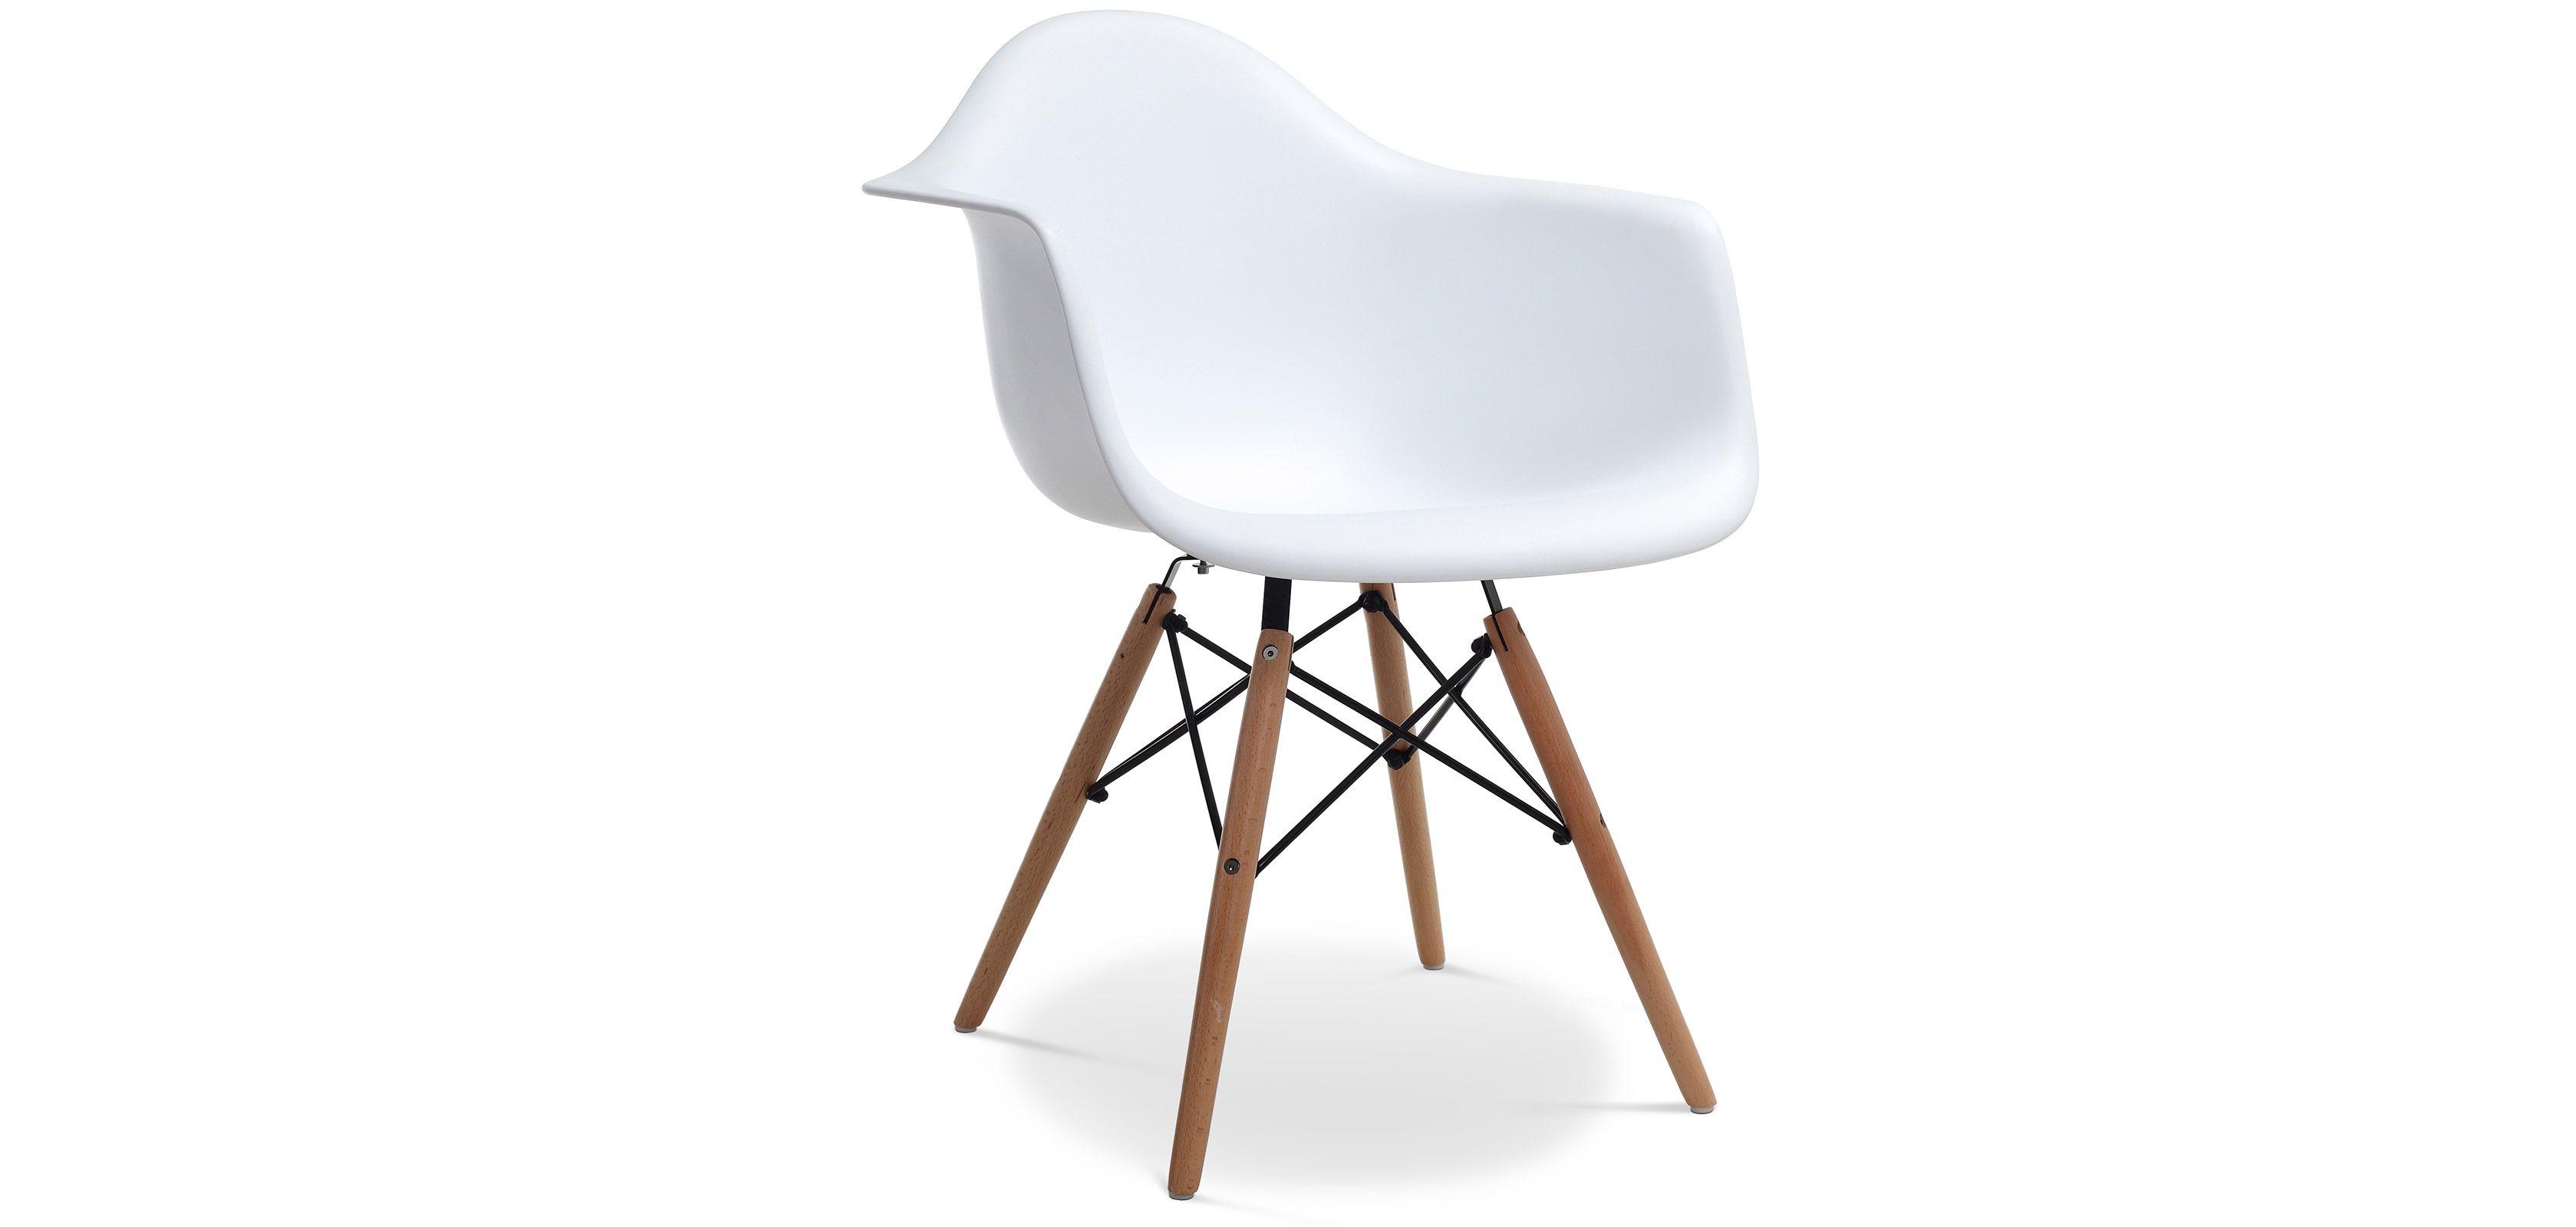 Chaise Daw Charles Eames Style Polypropylene Matt Pas Cher Idee Bureau Eames Chaise